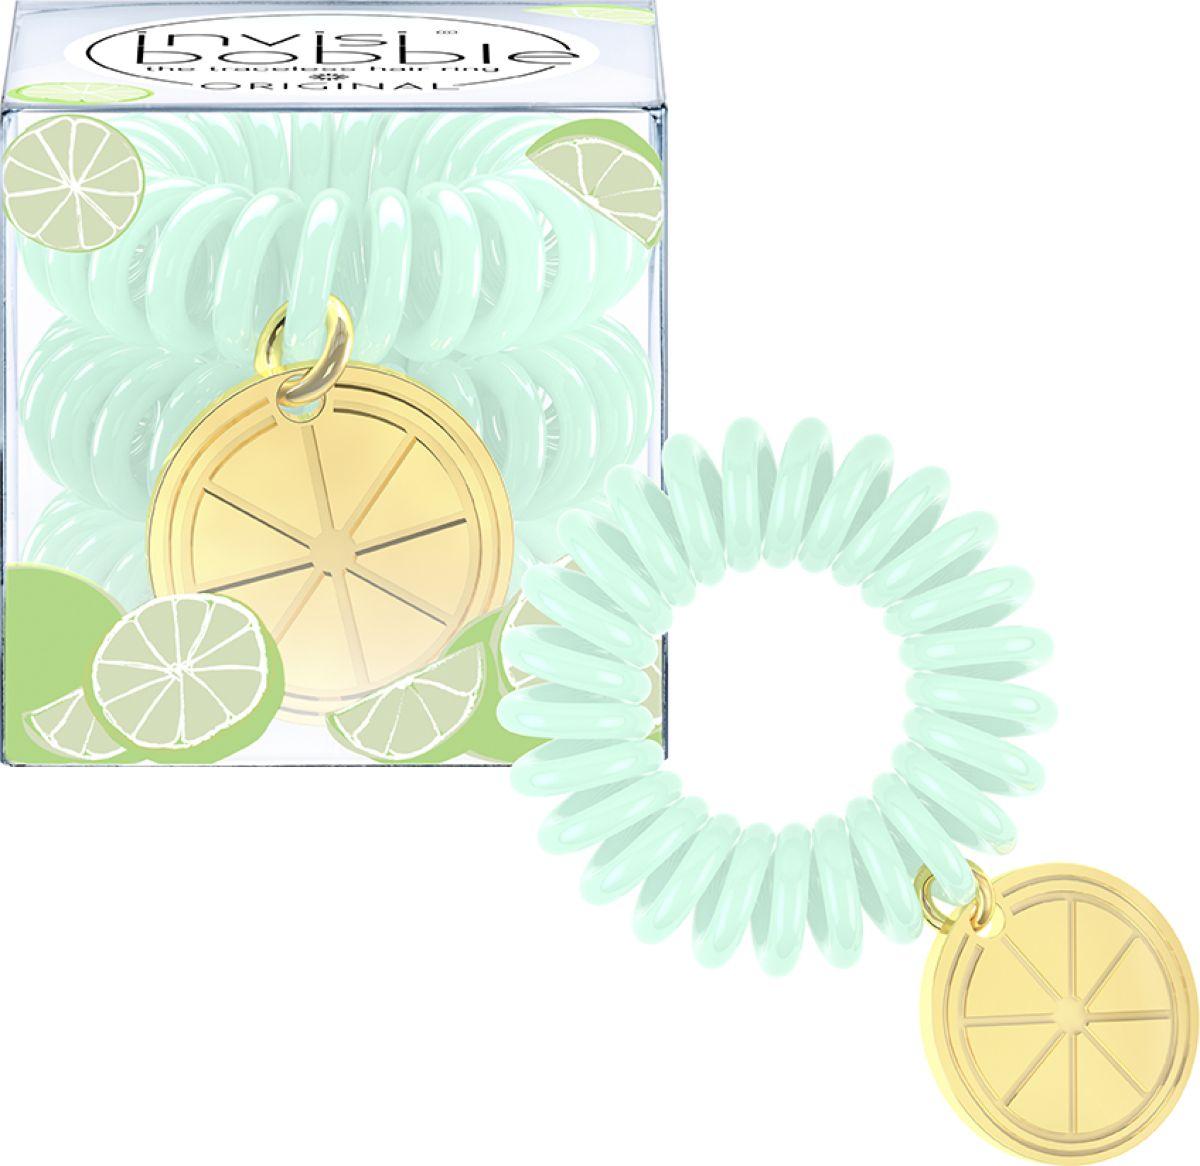 Invisibobble Резинка-браслет для волос Tutti Frutti Lime Time, 3 шт lime time кпб sateen comfort евро1 доминика 2 син борд